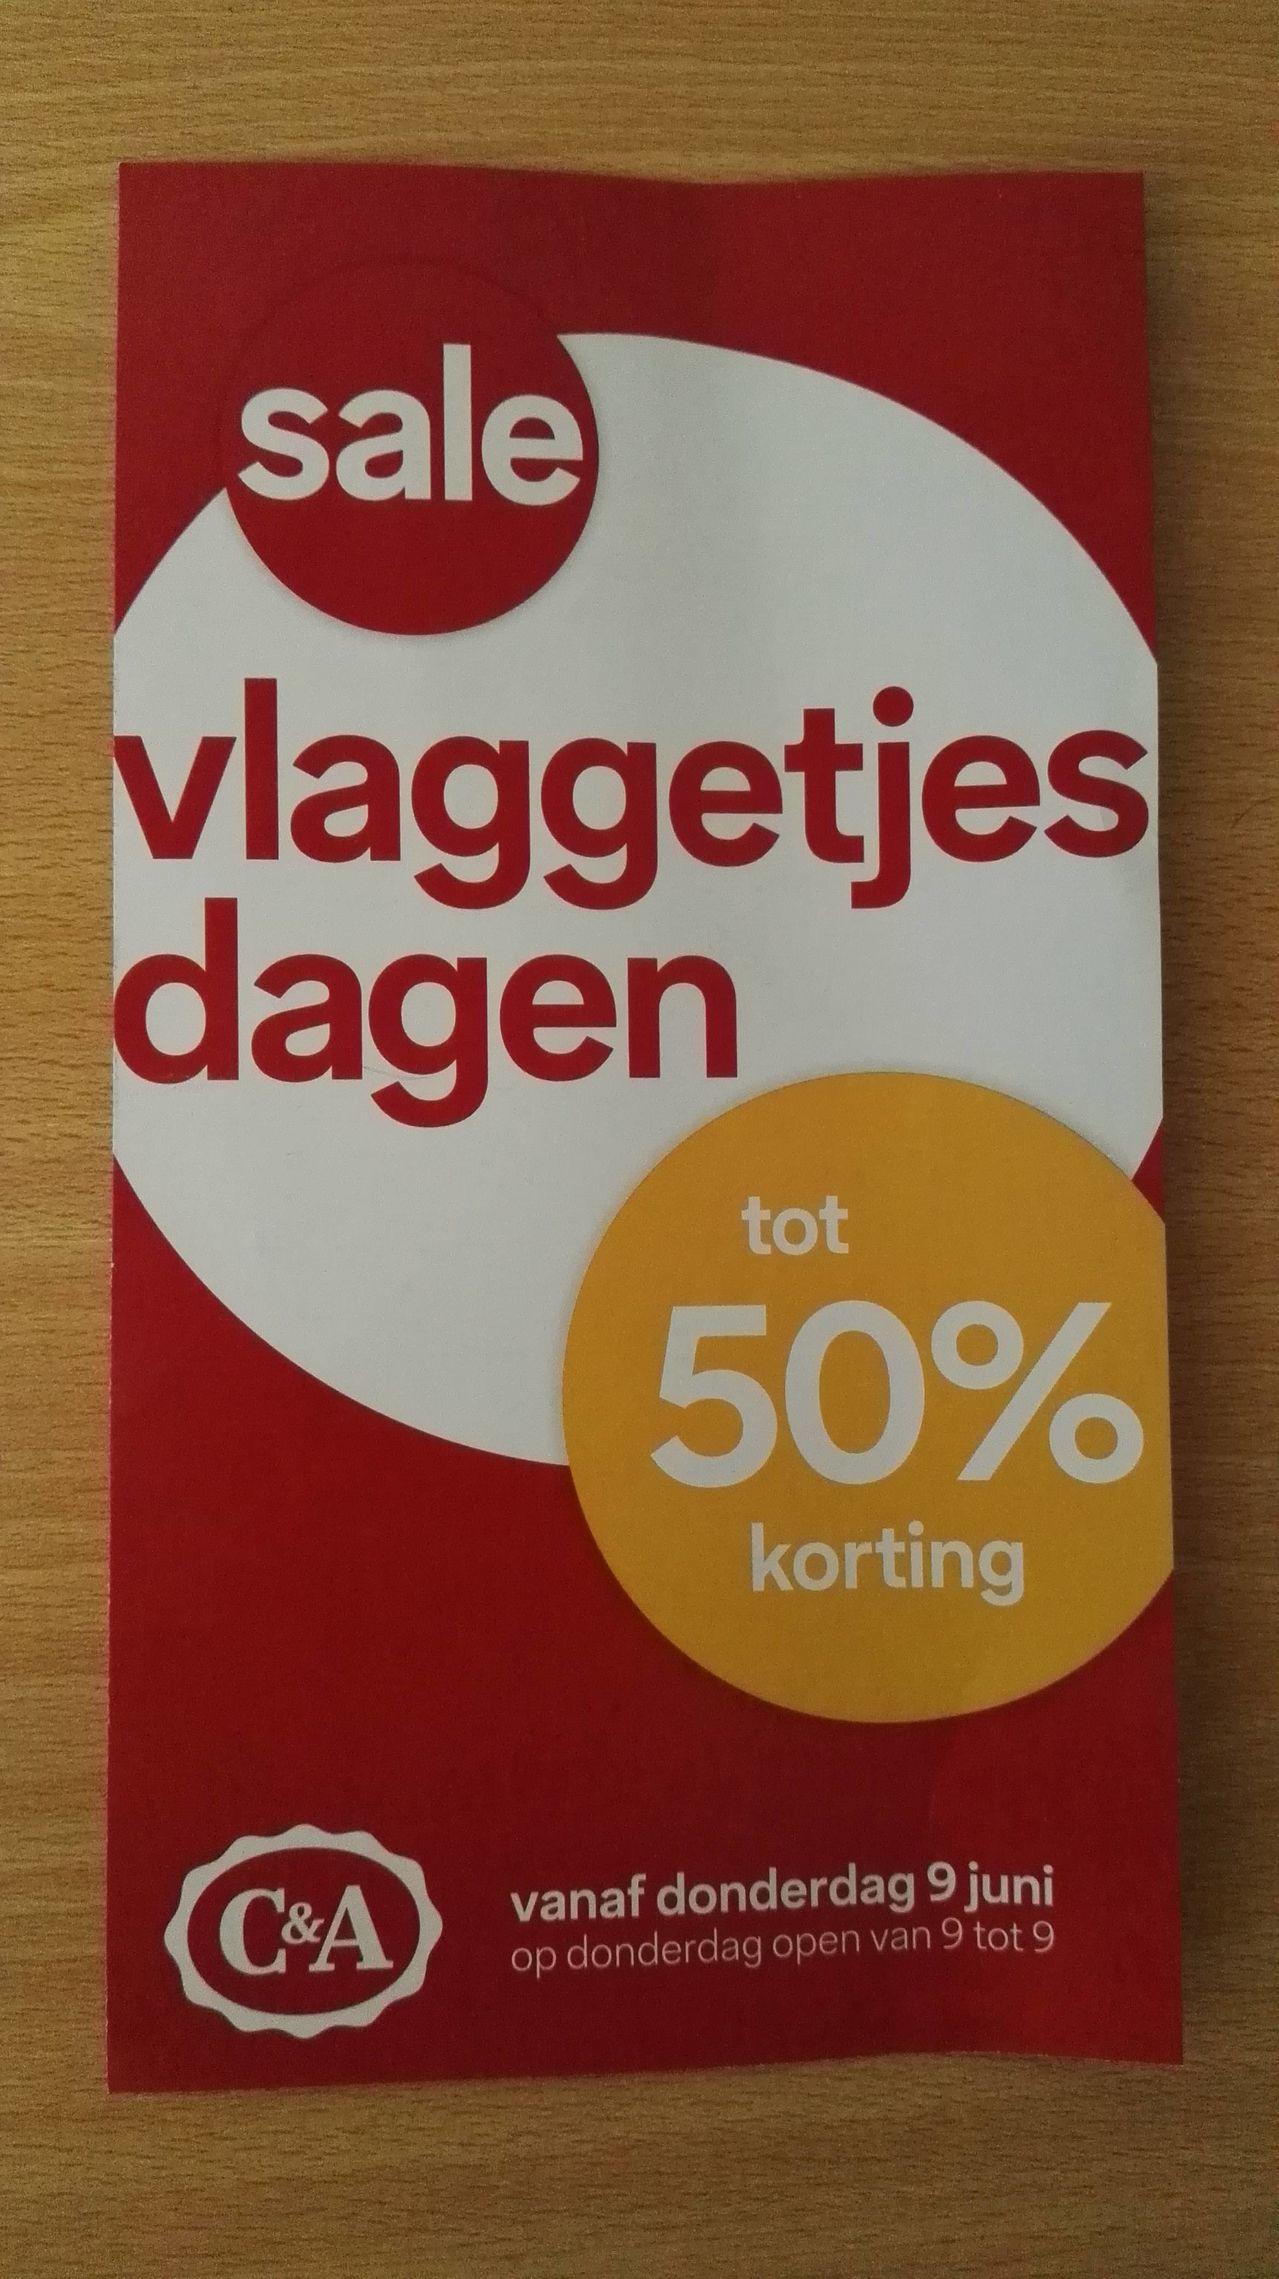 Vlaggetjesdagen met kortingen tot 50% korting (+ 10% of €5 extra) @ C&A